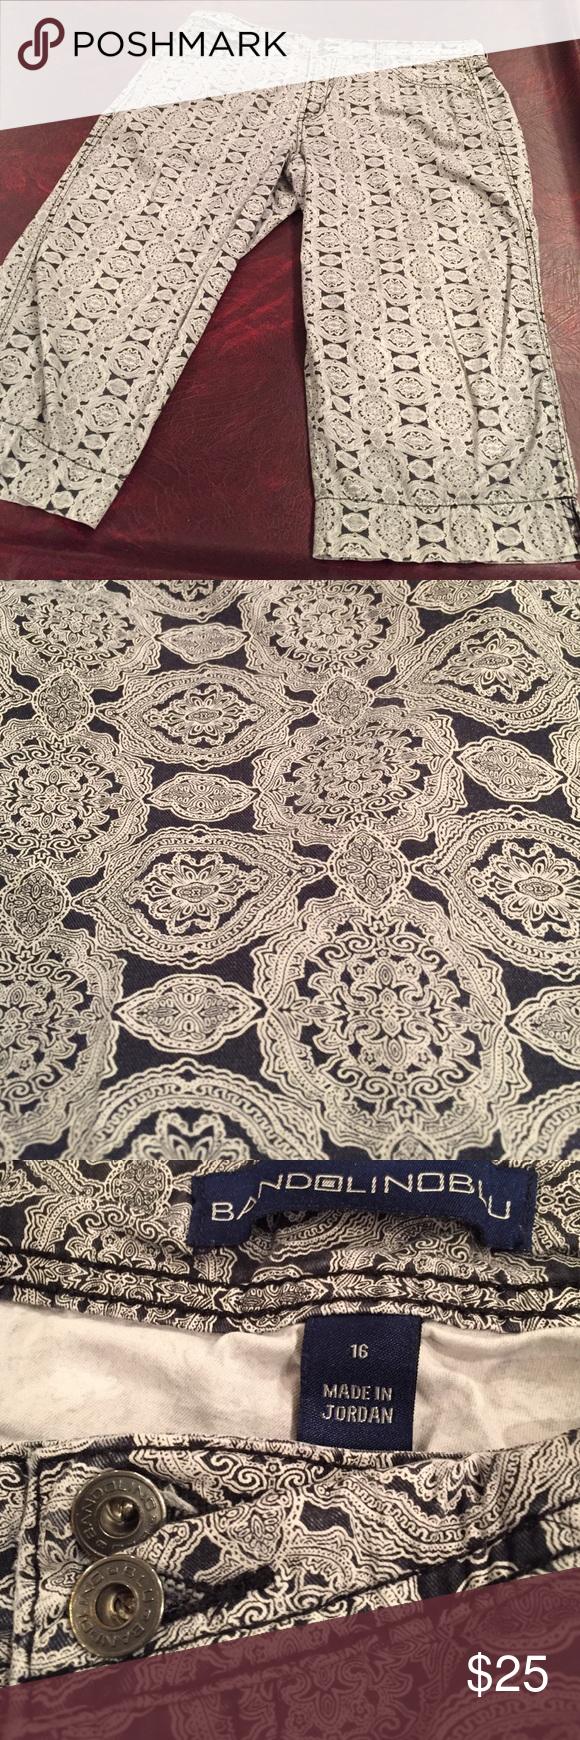 Bandolino blu crop patterned pants/vertical stripe Vertical stripe illusion in these beautiful patterned pantscreate a slimming line in a cute patterned pant. Bandolino Pants Ankle & Cropped